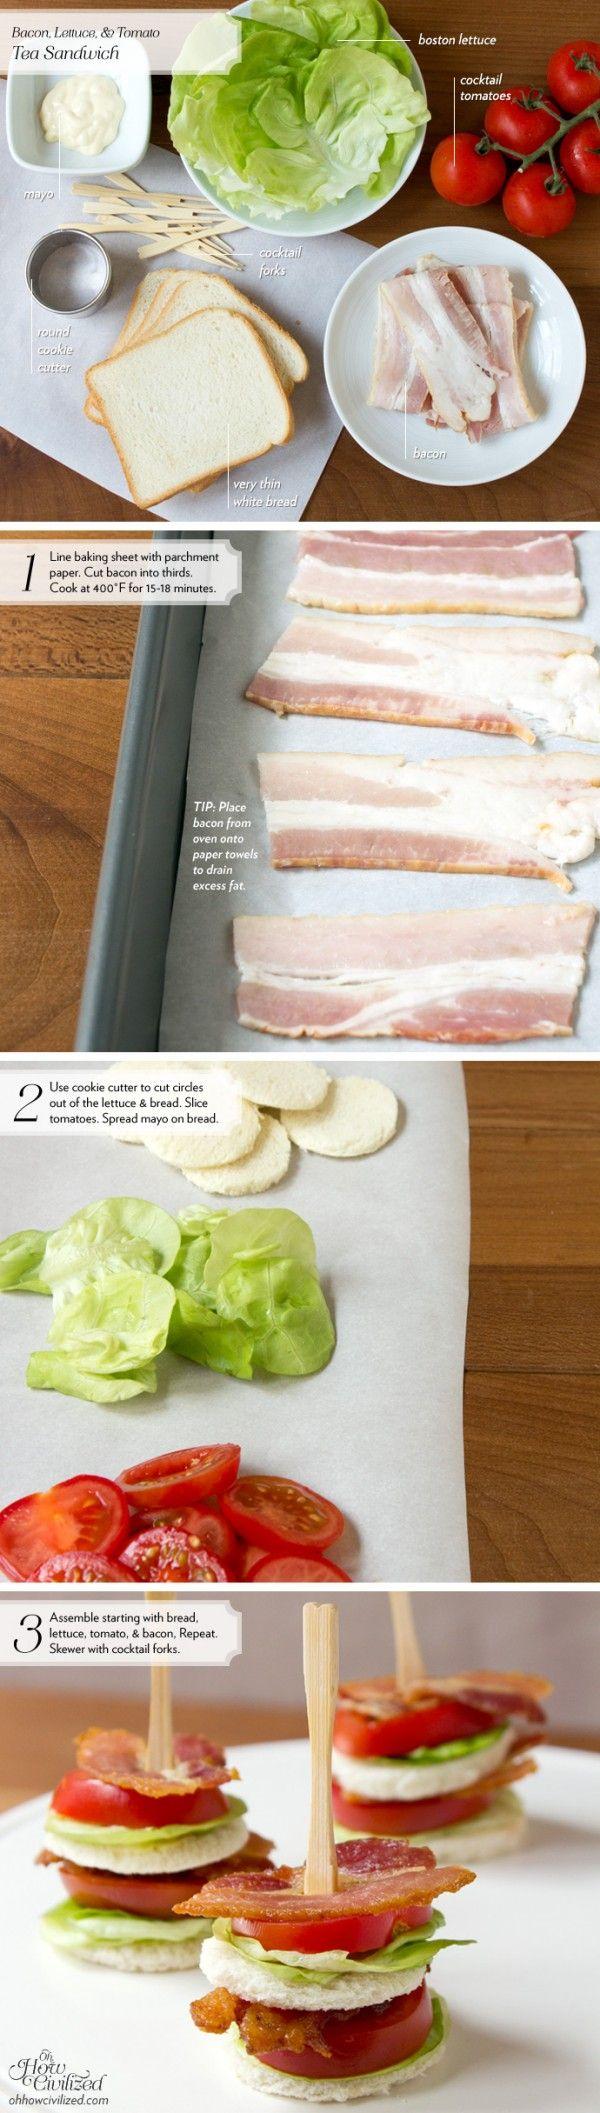 0713_bacon_lettuce_tomato_tea_sandwich